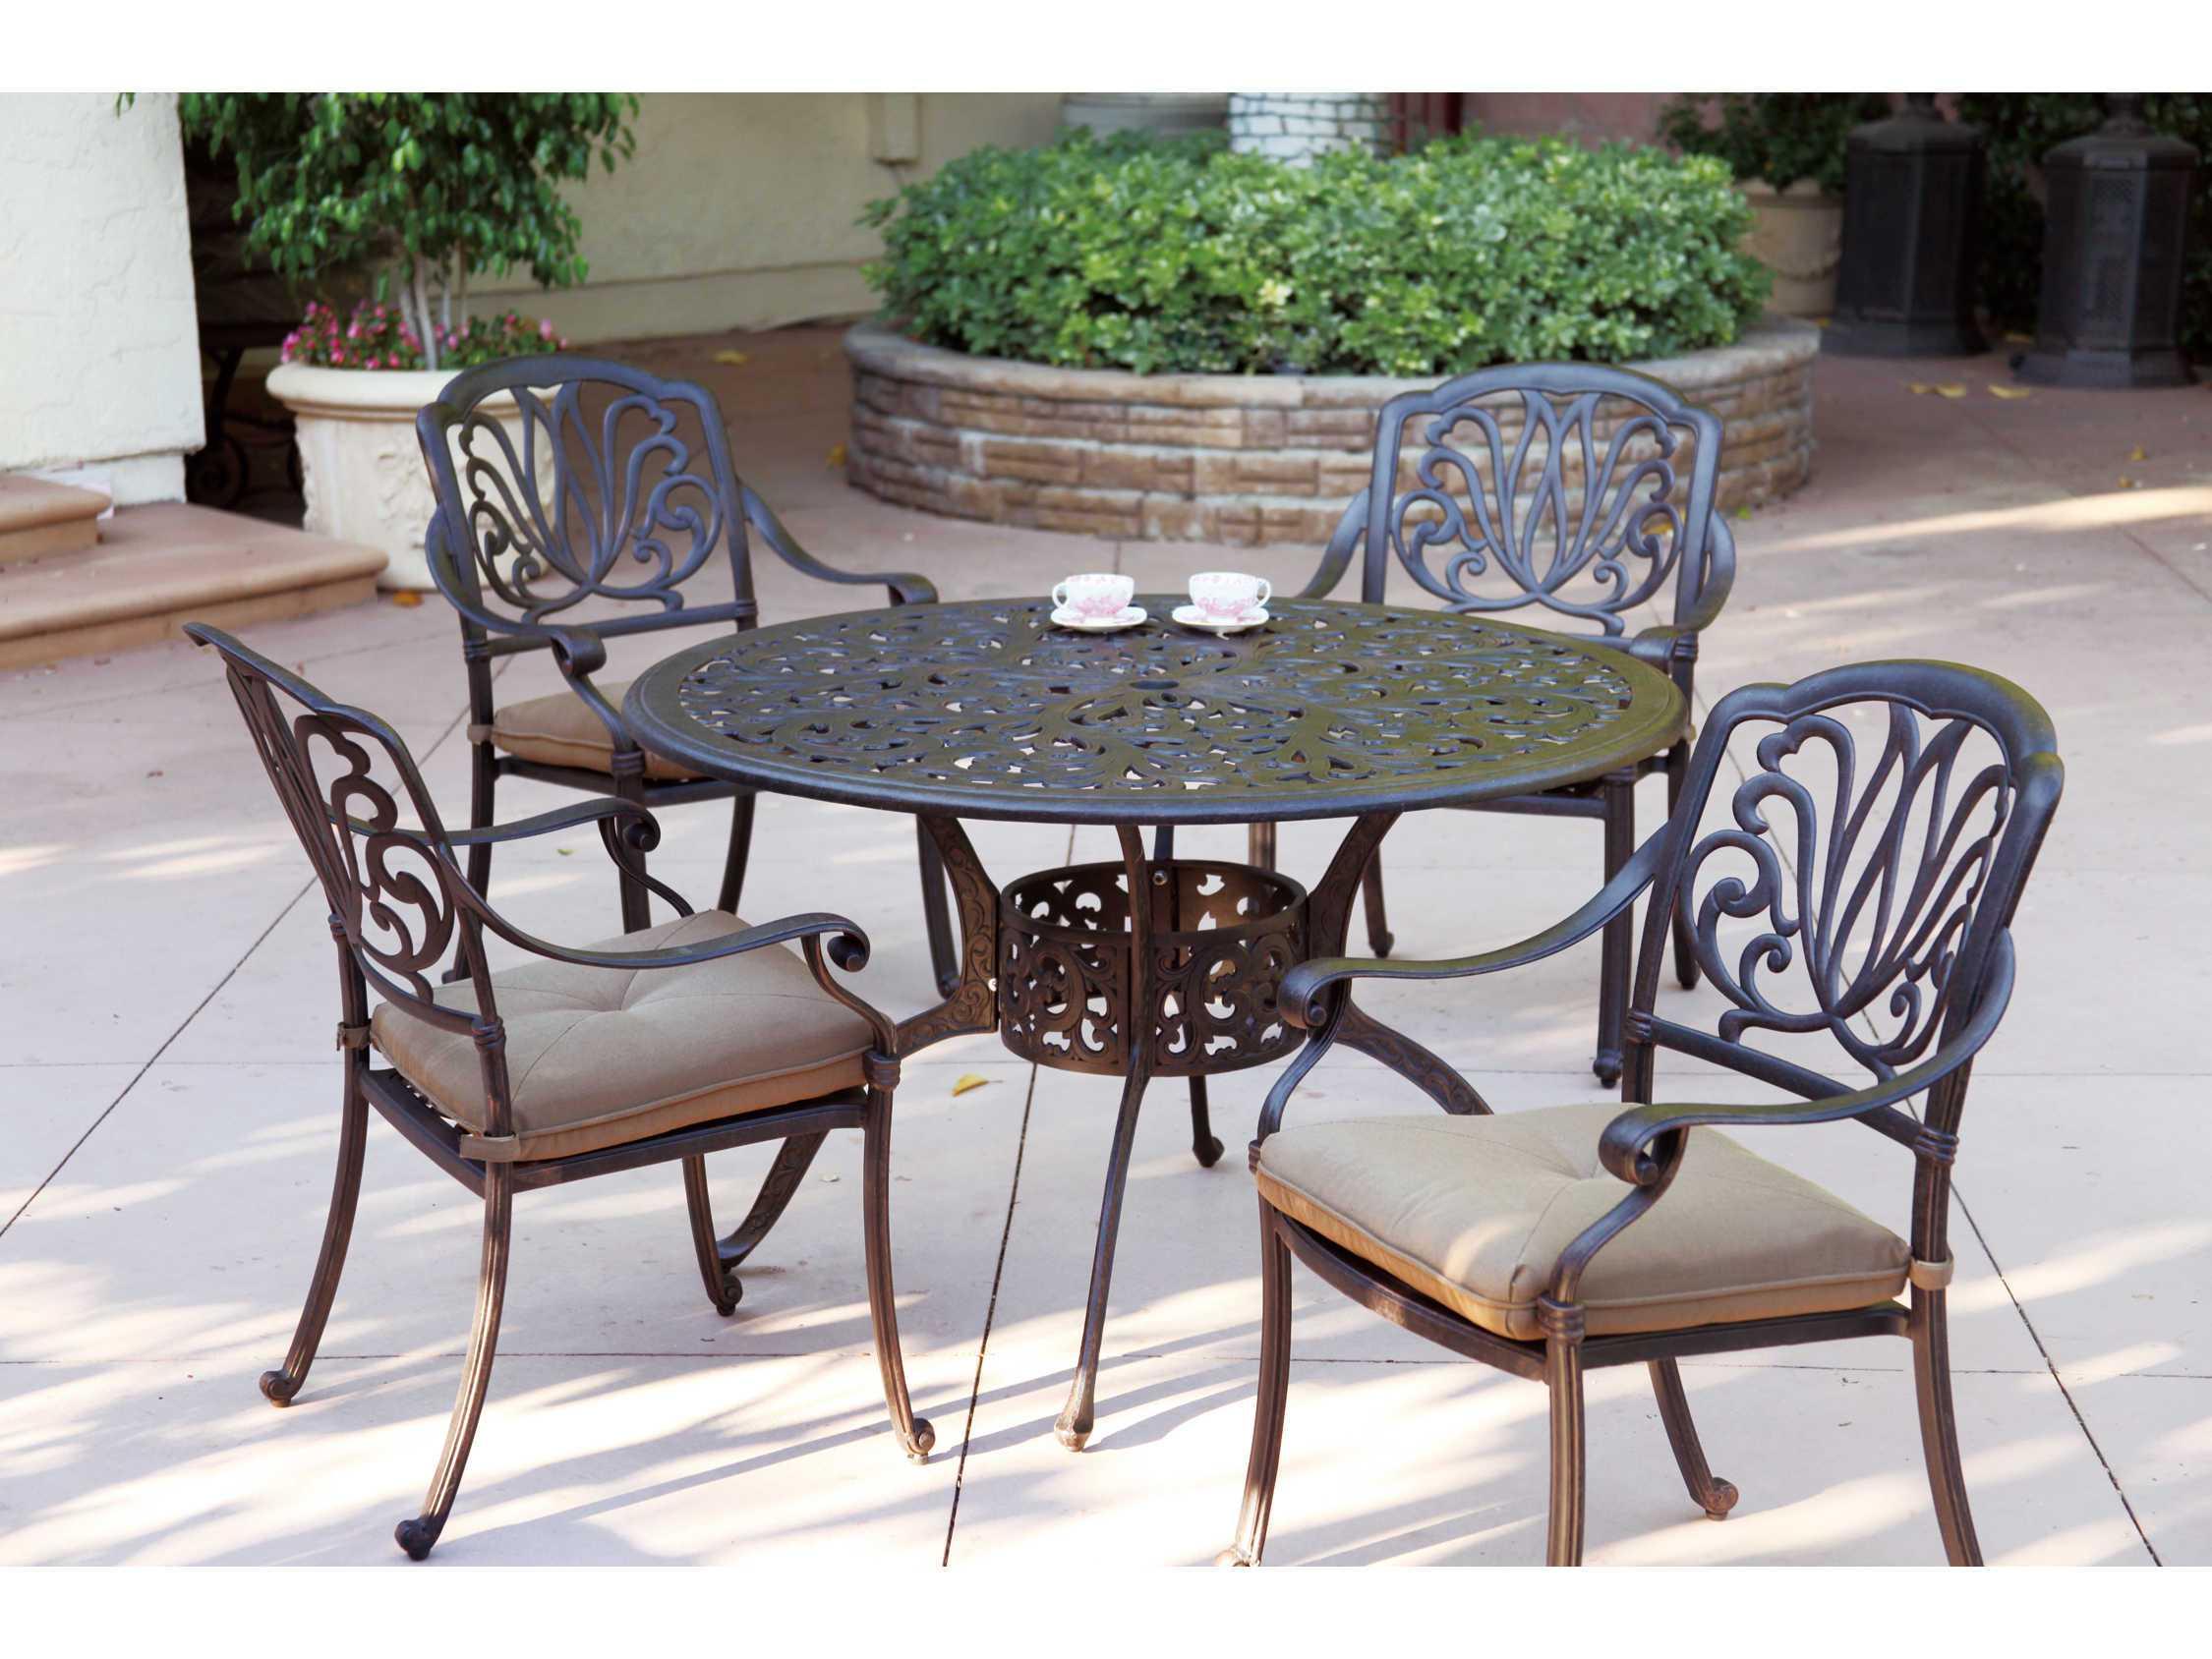 Pleasing Darlee Outdoor Living Series 80 Cast Aluminum Antique Bronze 48 Round Dining Table Home Interior And Landscaping Spoatsignezvosmurscom